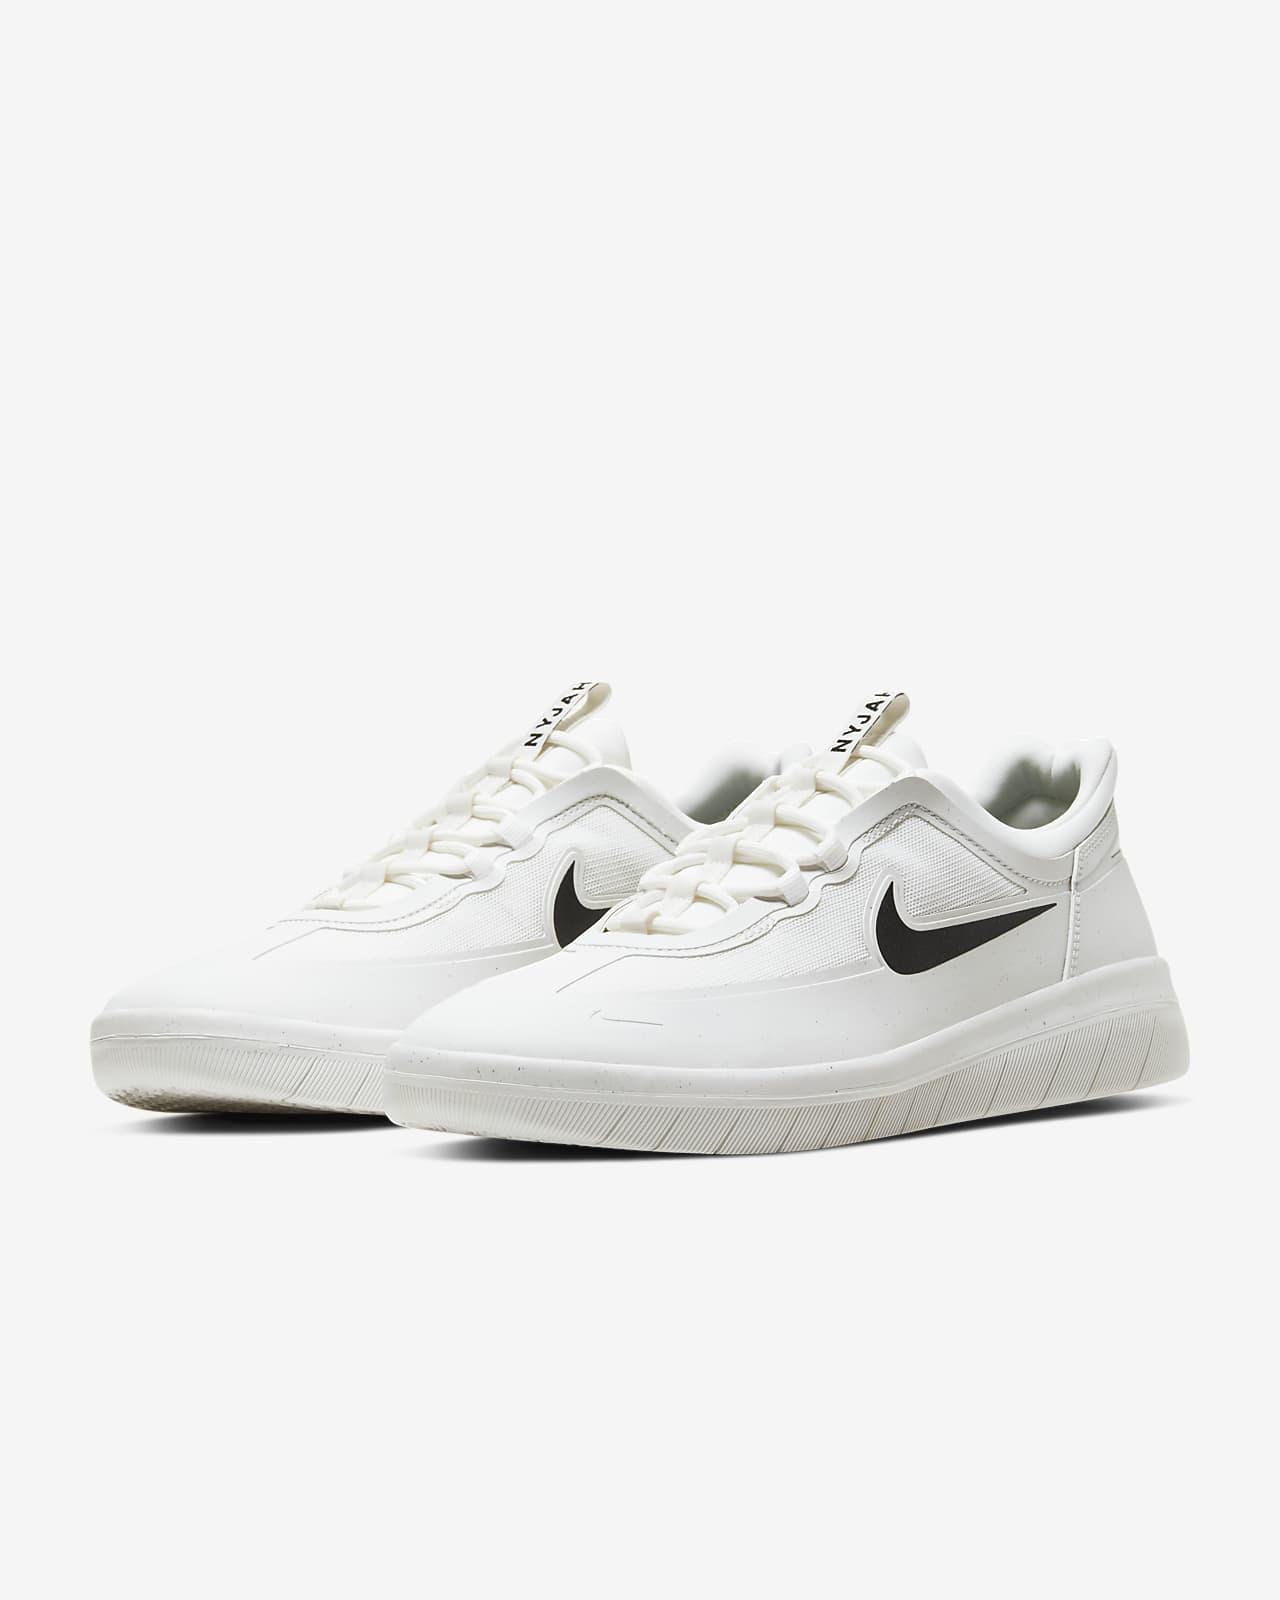 Nike SB Nyjah Free 2 Skate Shoe. Nike LU